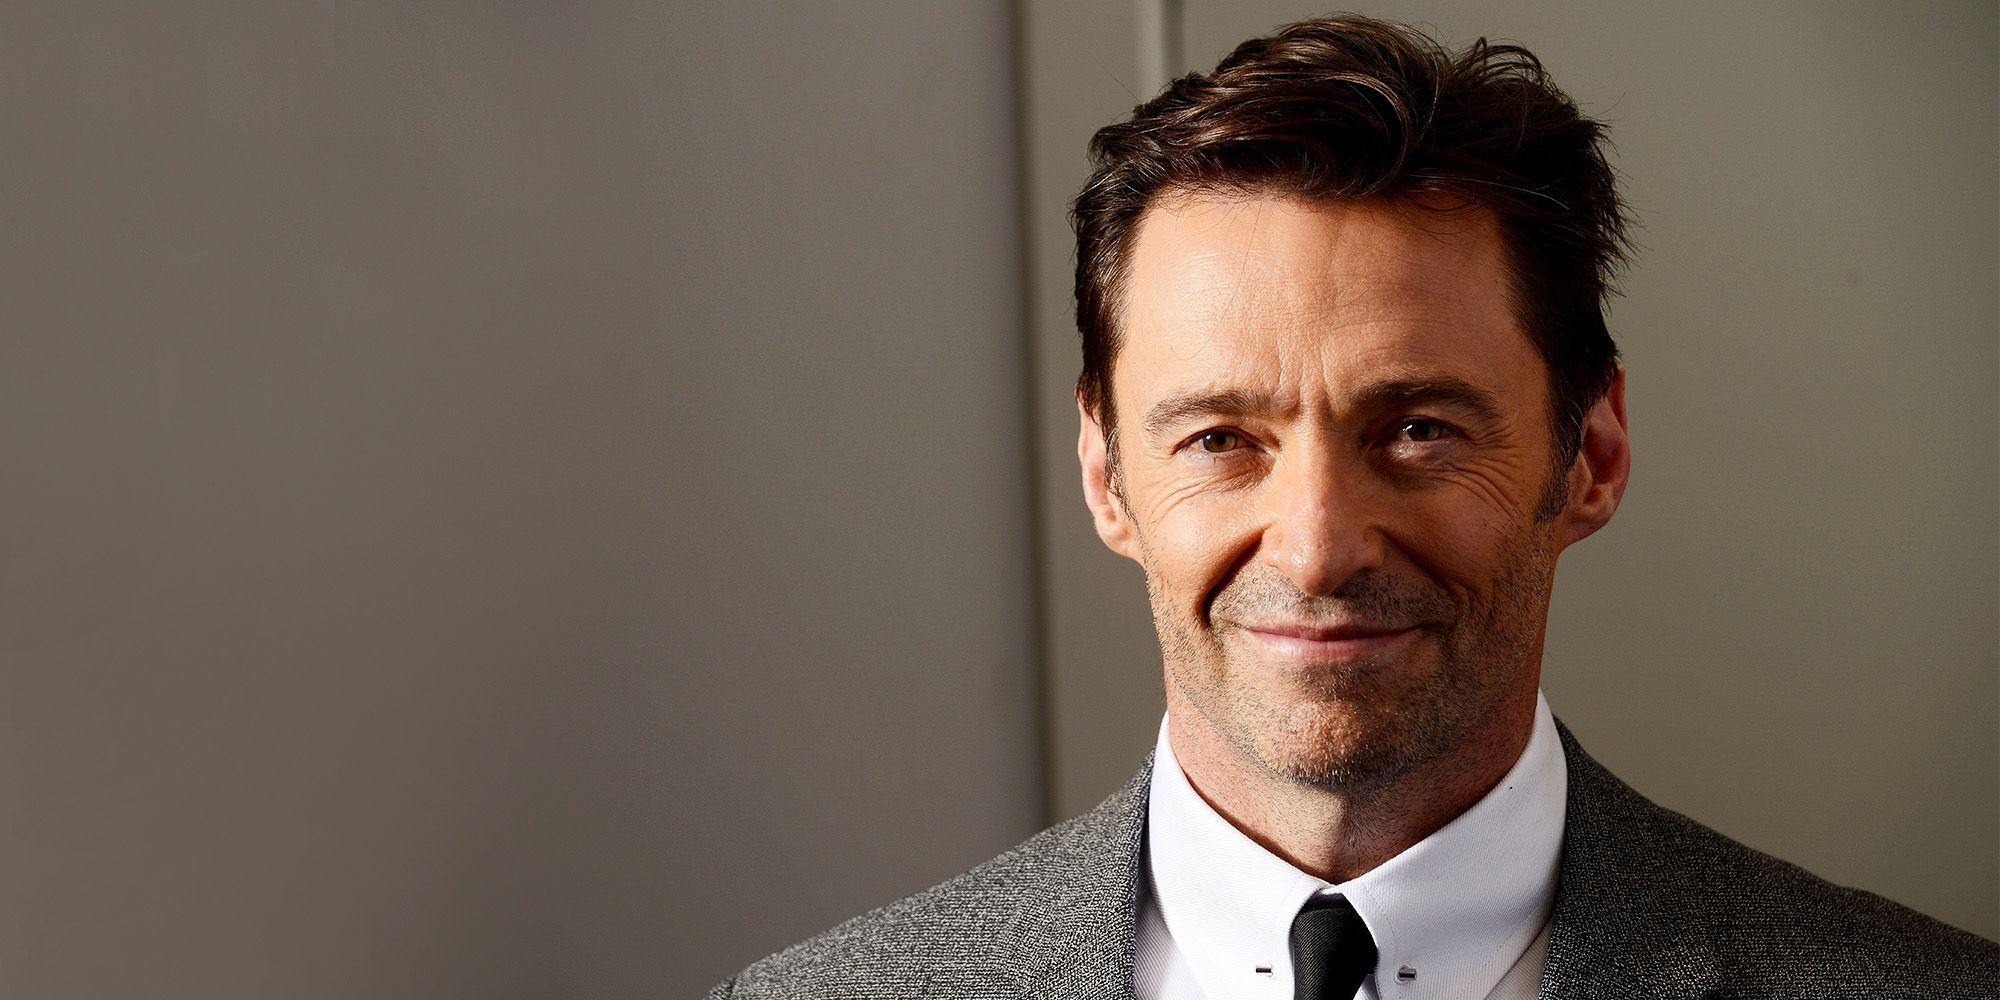 Hugh Jackman Reveals Why He Turned Down Playing James Bond